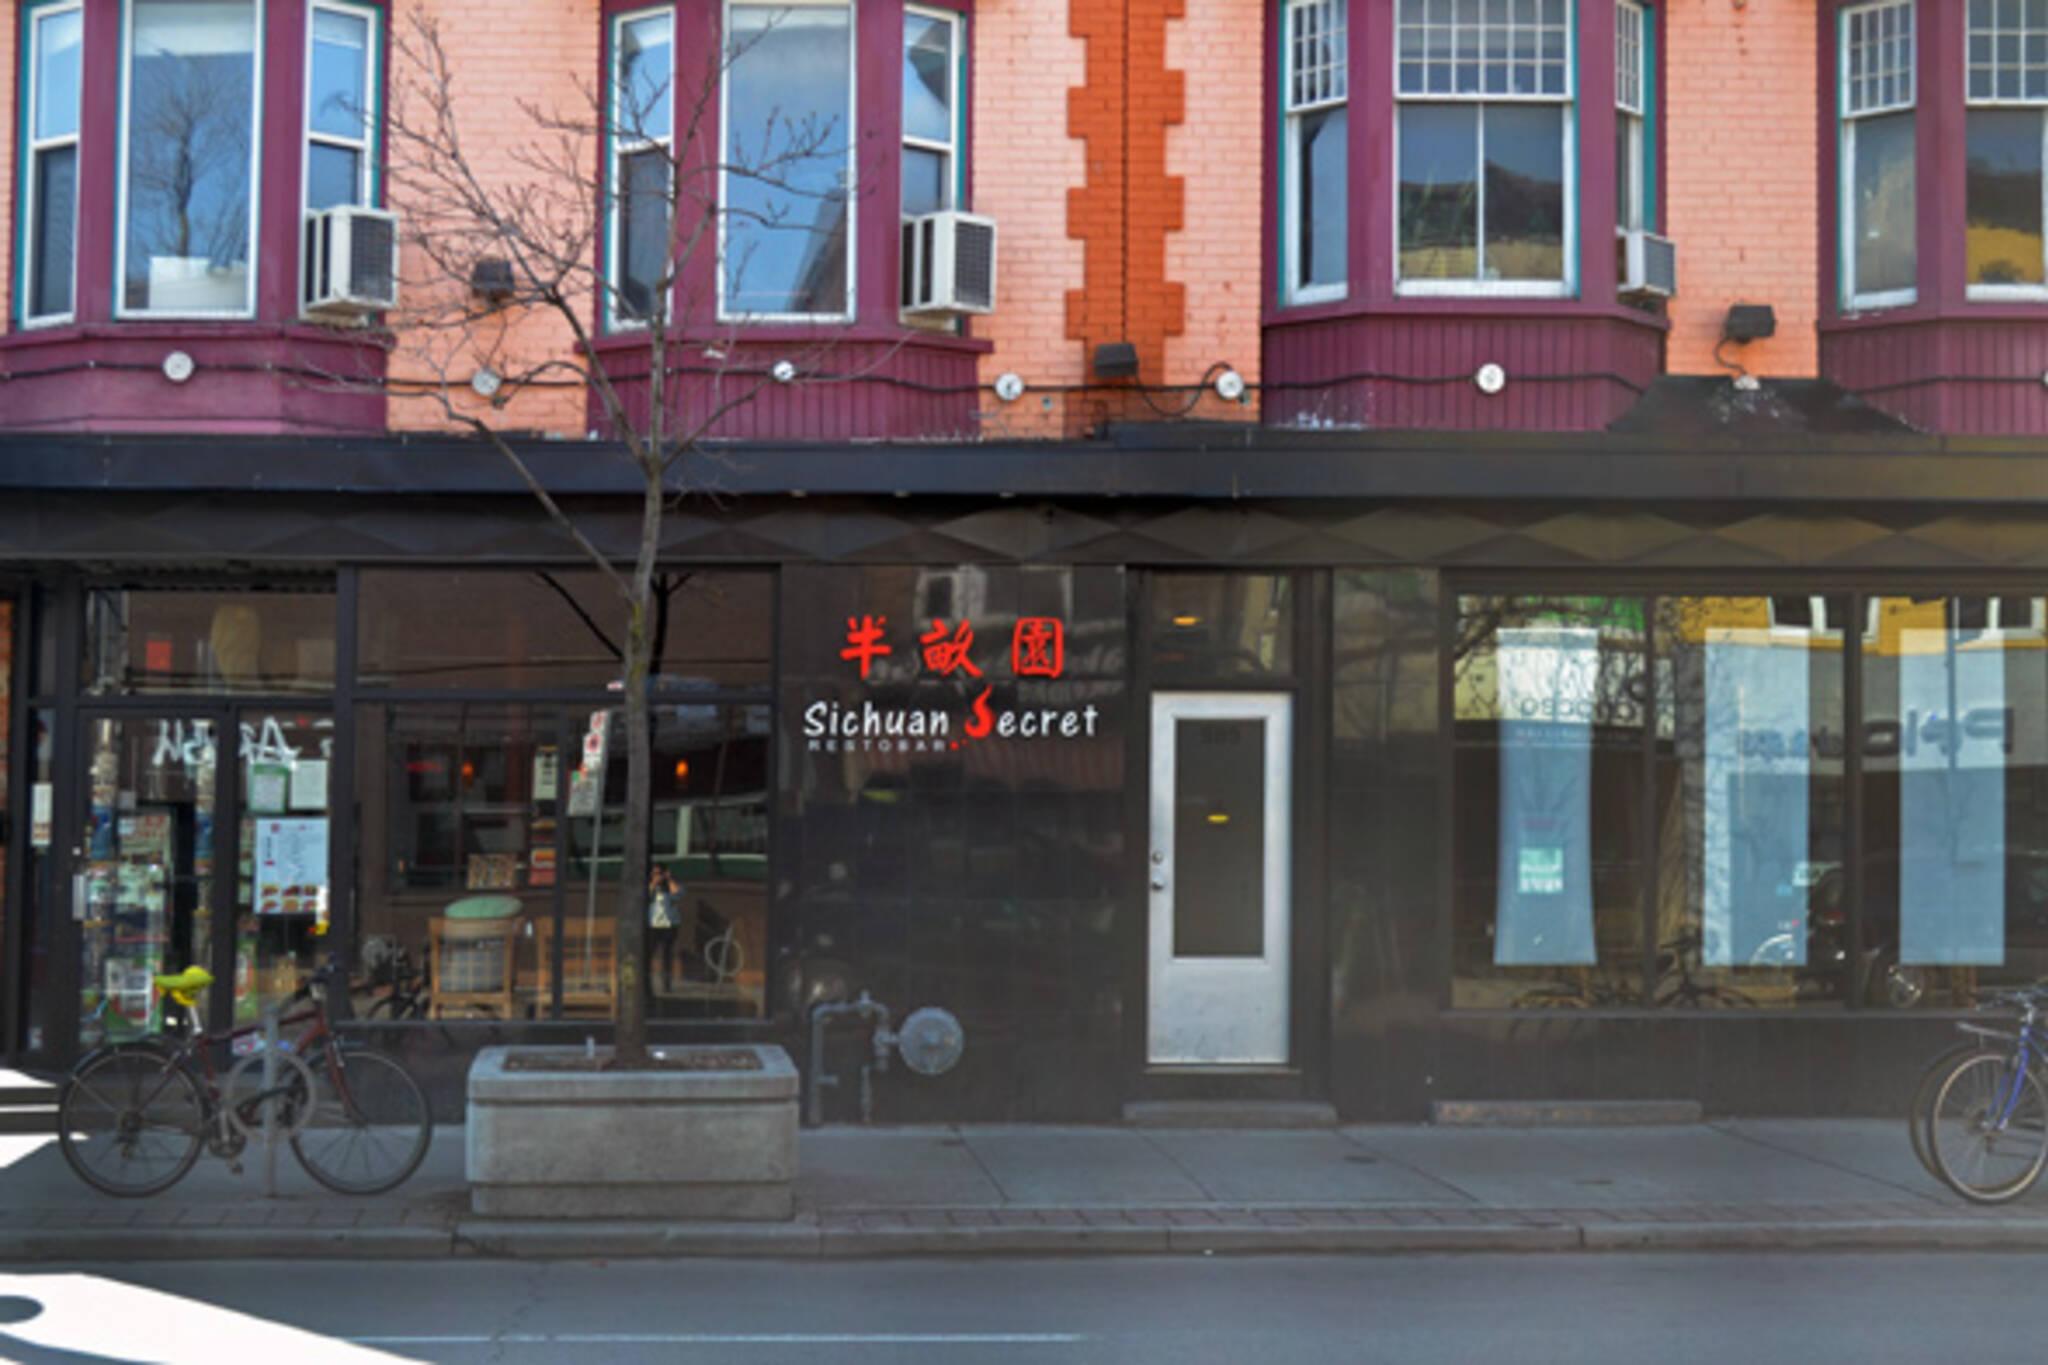 Sichuan Secret Toronto